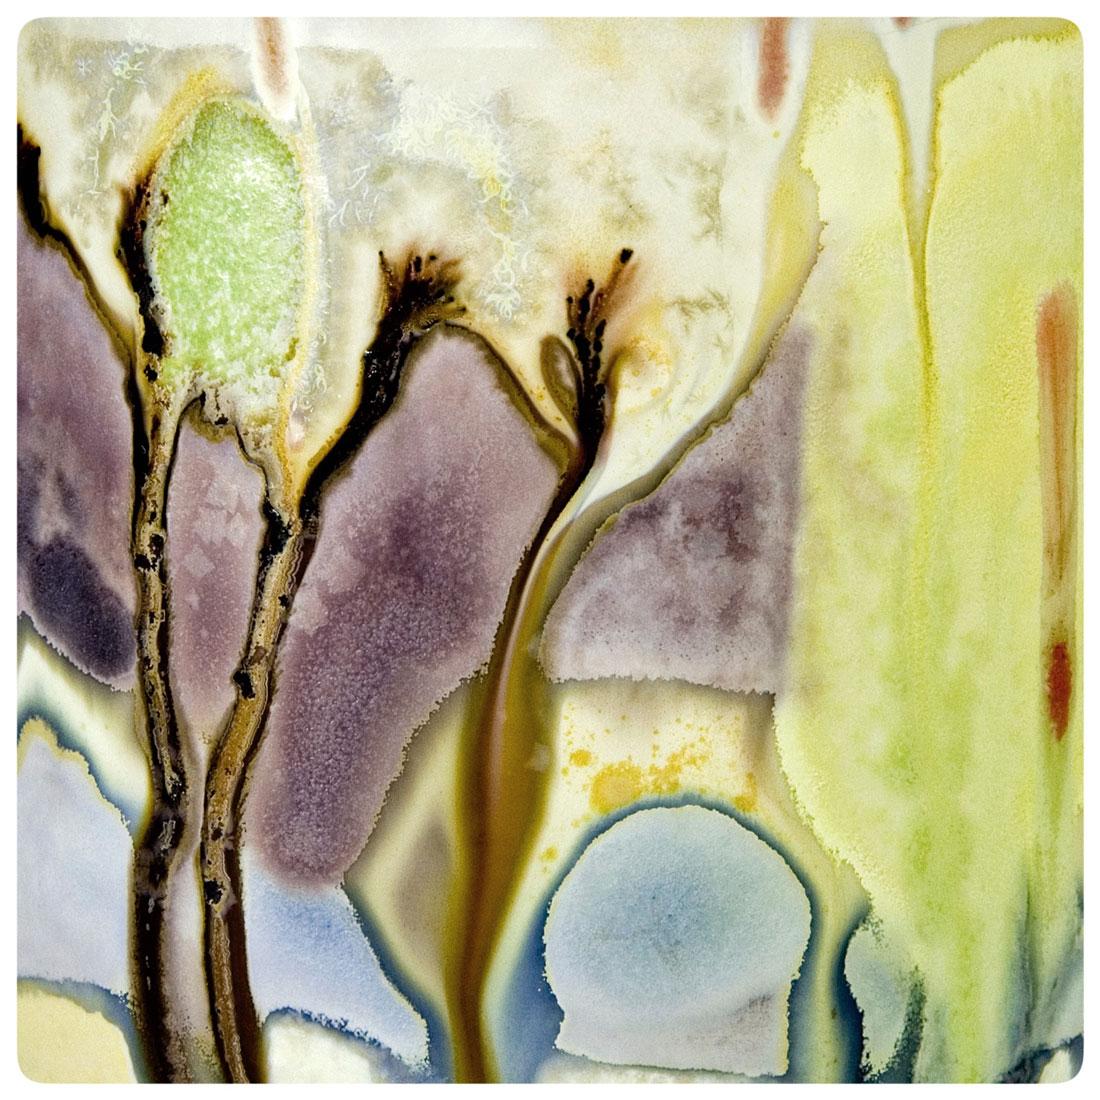 Copy of 13.Crystalline Glaze Detail of an Art Flow cup by Samantha Henneke | Bulldog Pottery | Seagrove | North Carolina